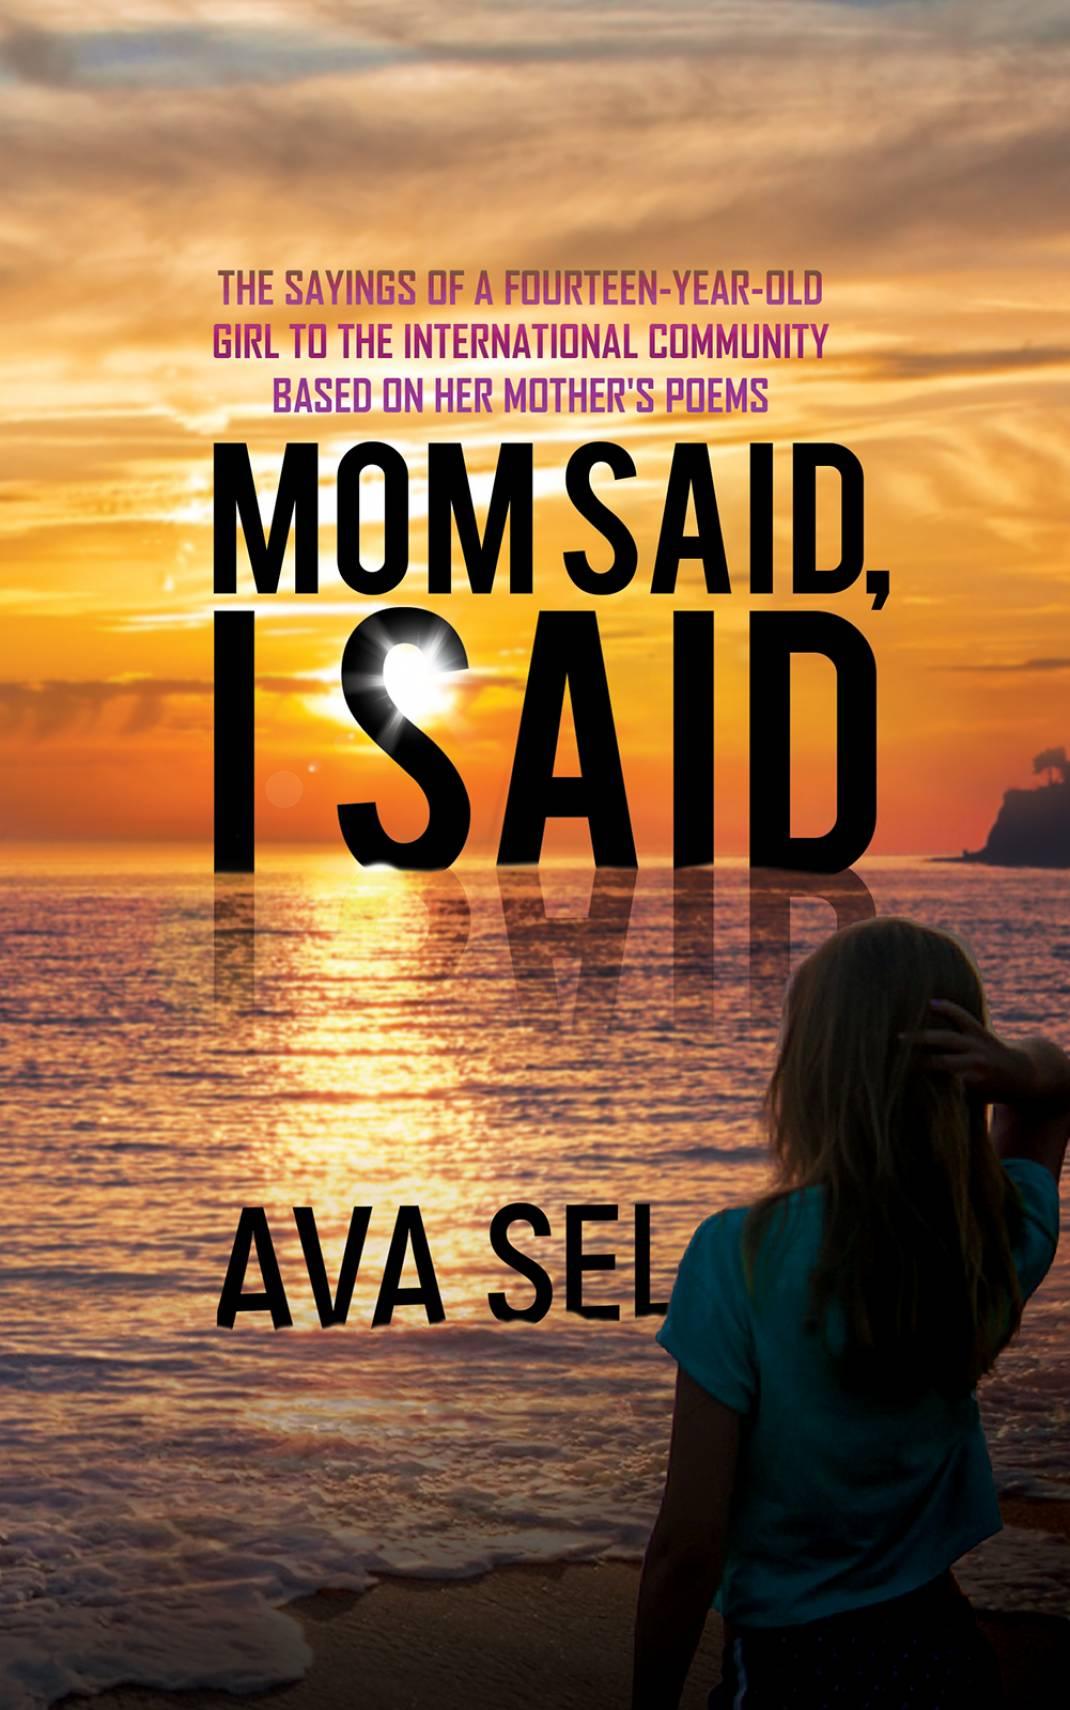 Mom Said, I Said | Book| Austin Macauley Publishers USA